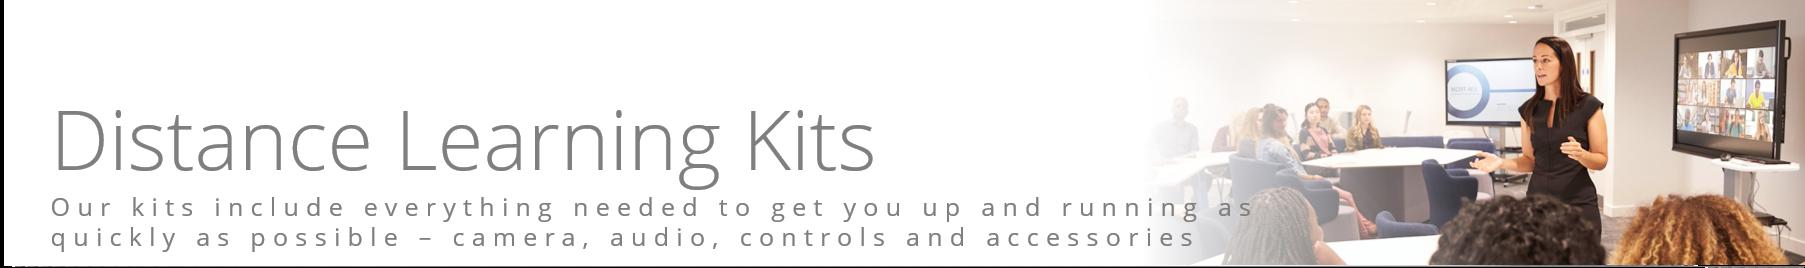 Room Kit from VCGear.com